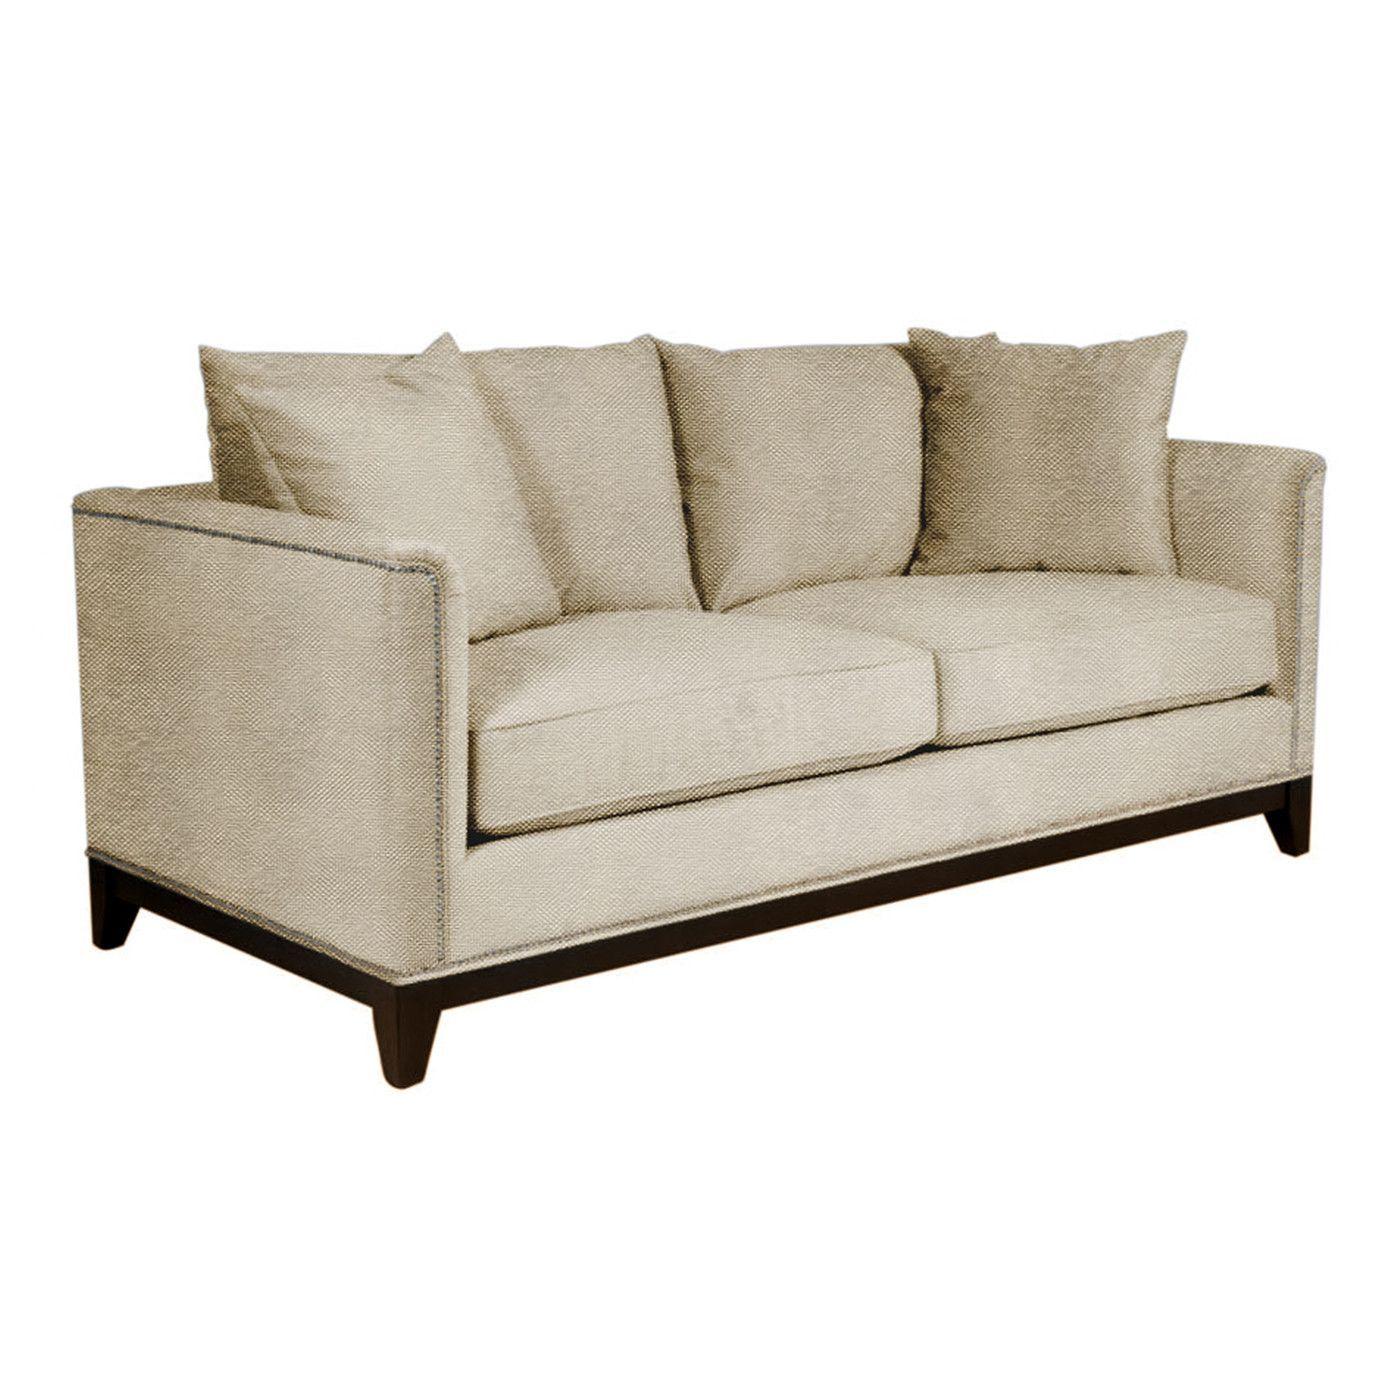 Apt2B La Brea Apartment Size Sofa | Contemporary Sofas | Pinterest ...